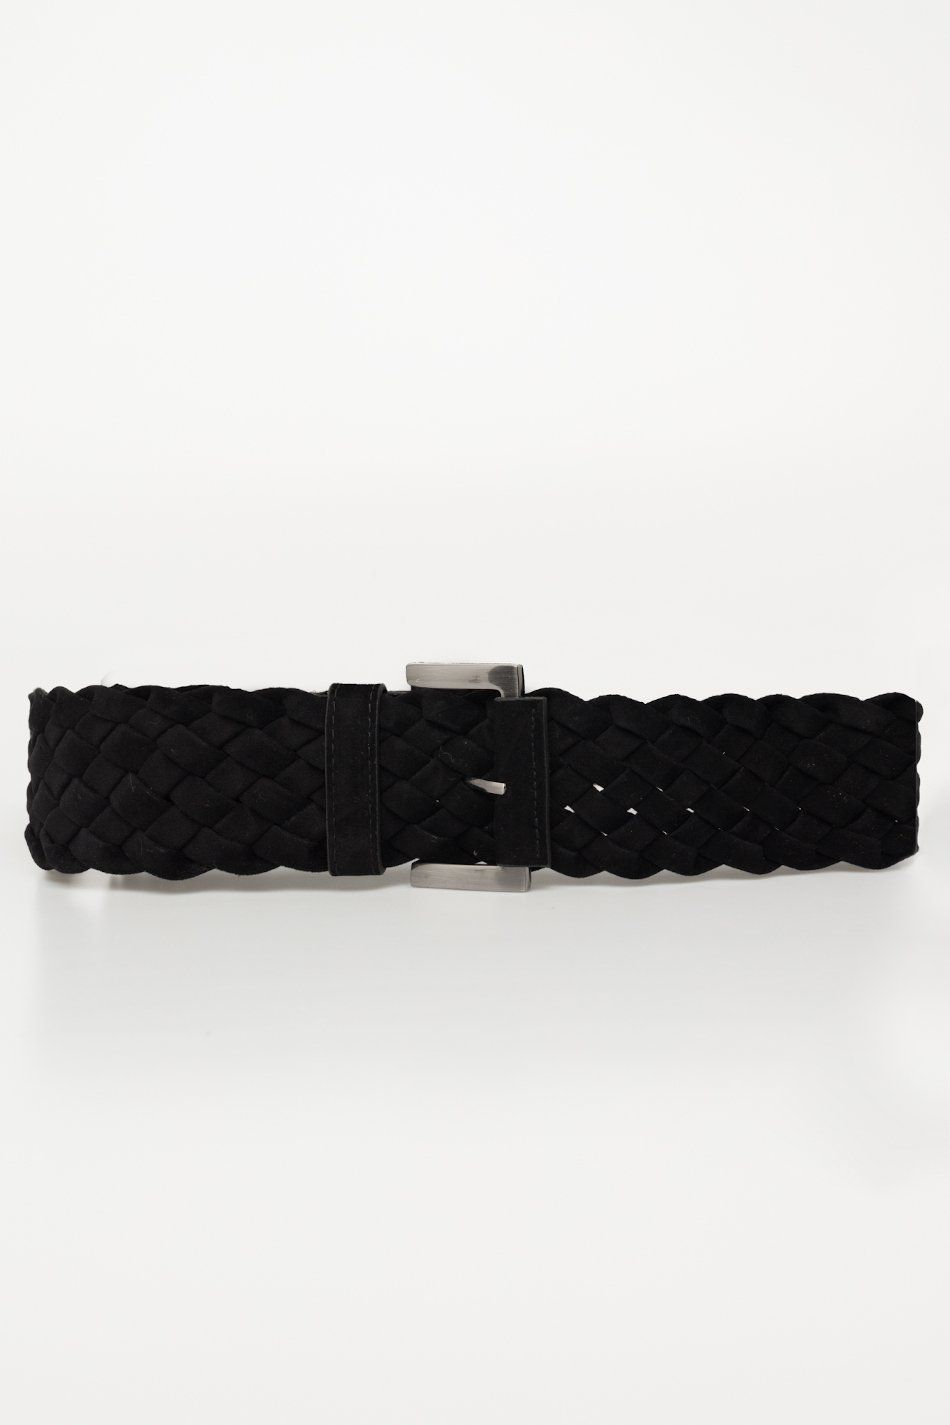 Cinturón trenzado antelina negro